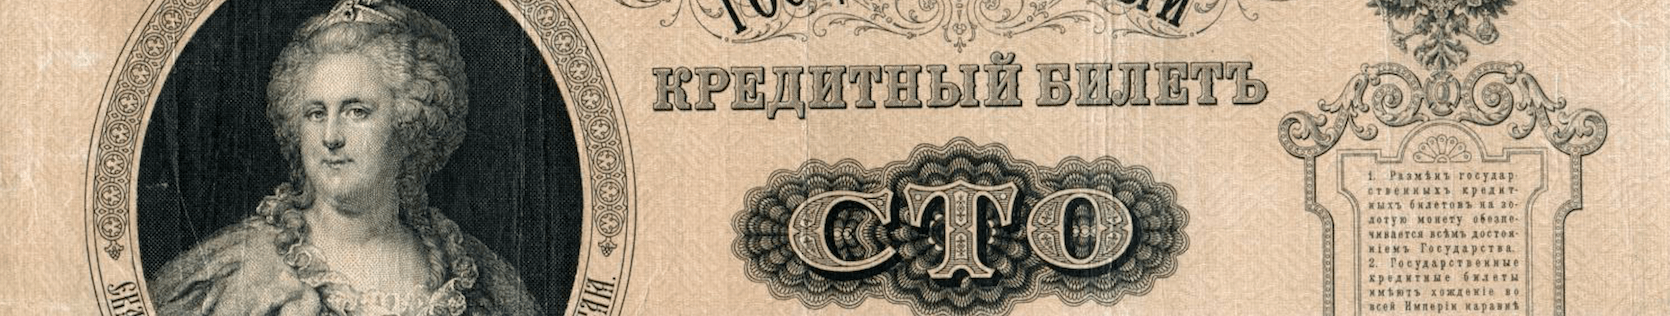 Аукцион денежных купюр